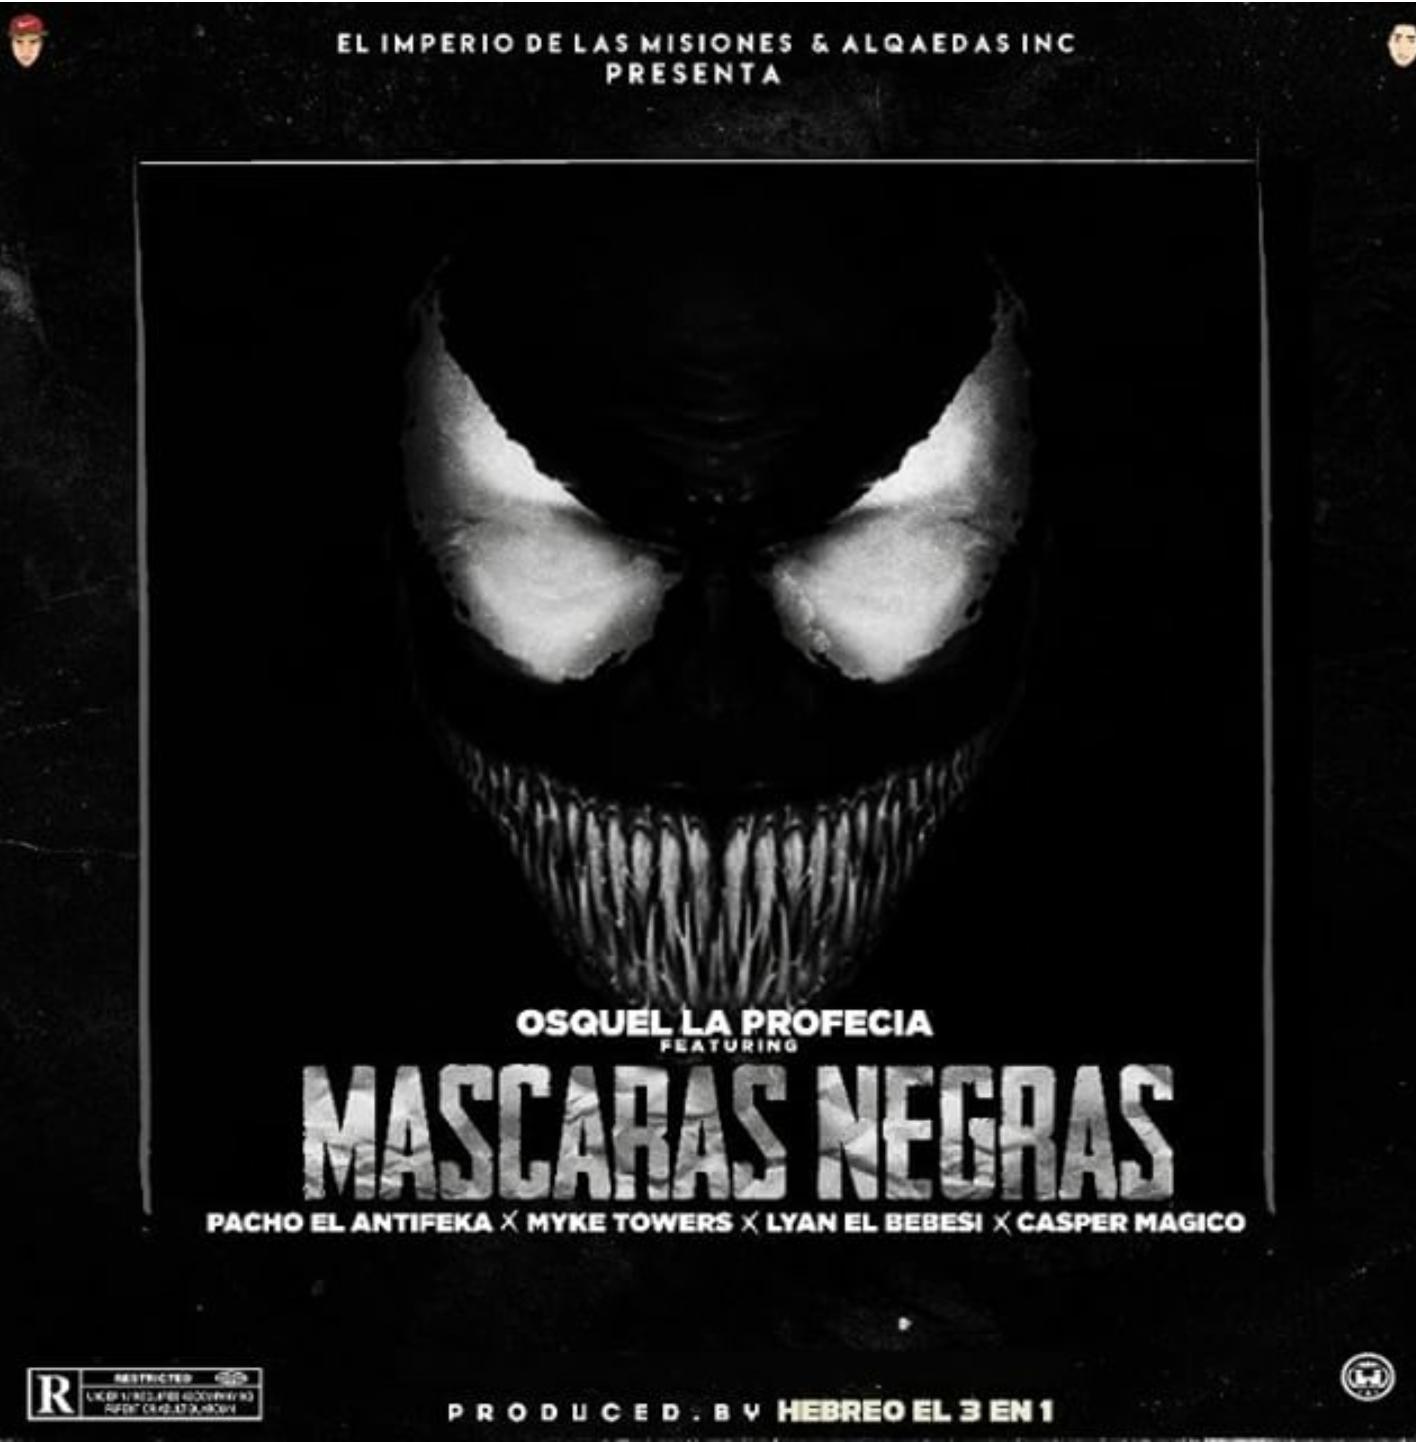 mascaras - Osquel Ft. Pacho, Myke Towers, Lyan El Bebesi Y Casper Magico - Mascaras Negras